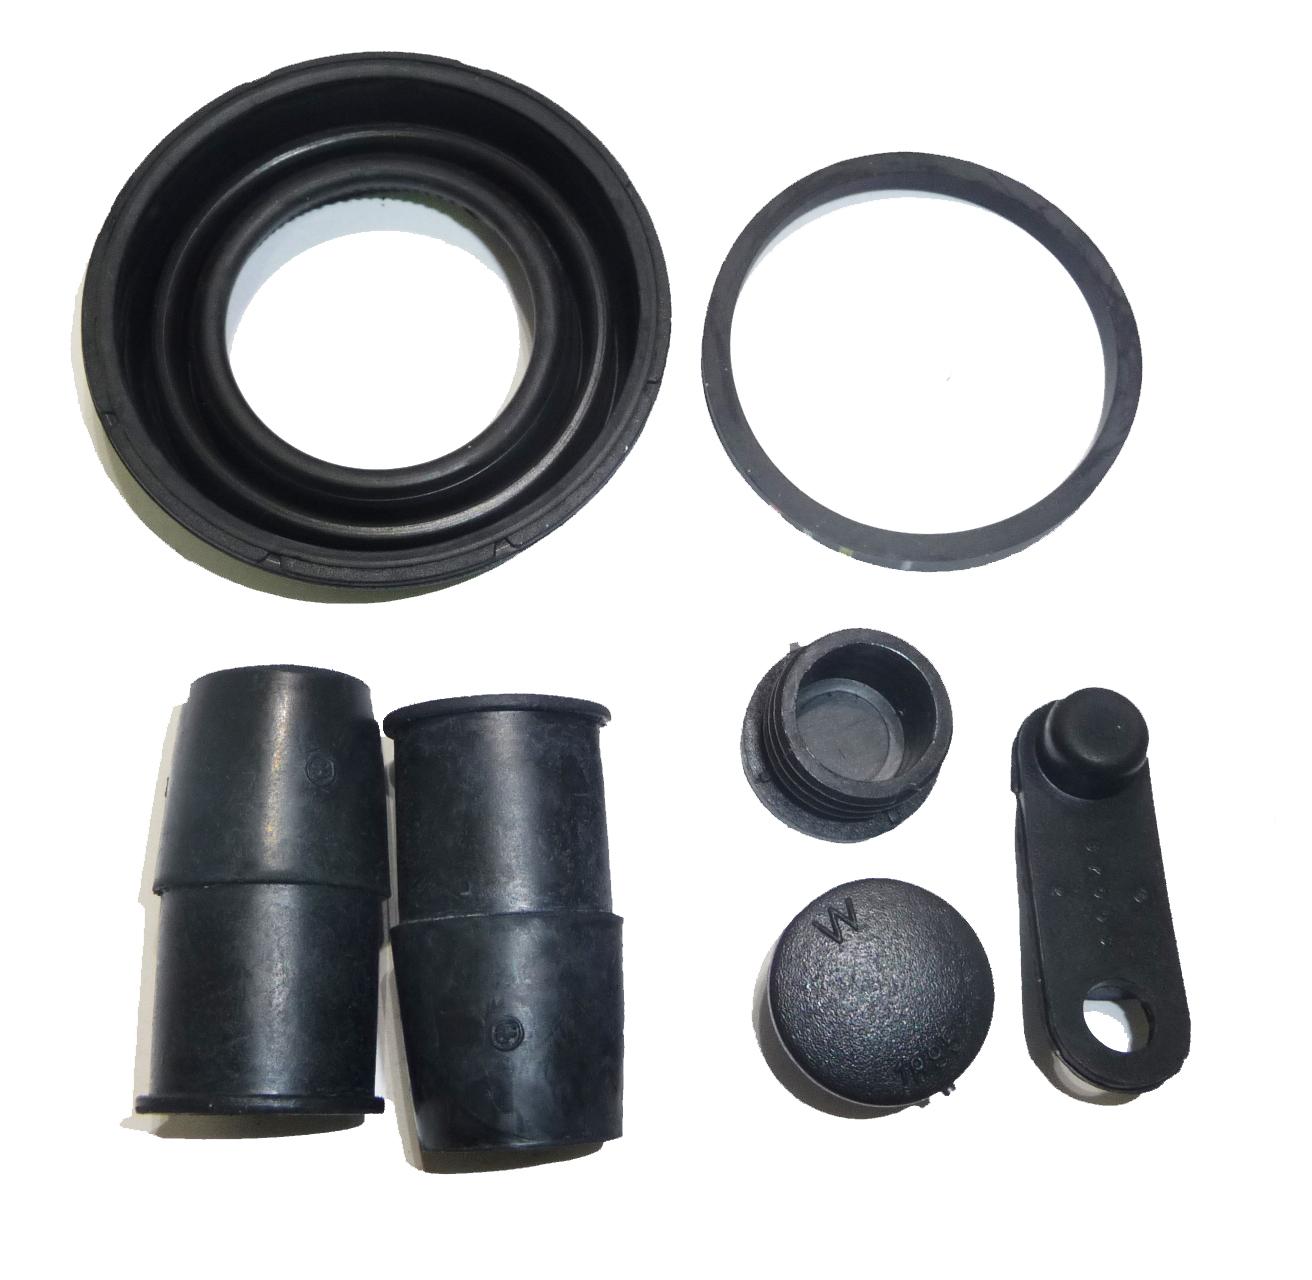 PW2036 Caliper kit